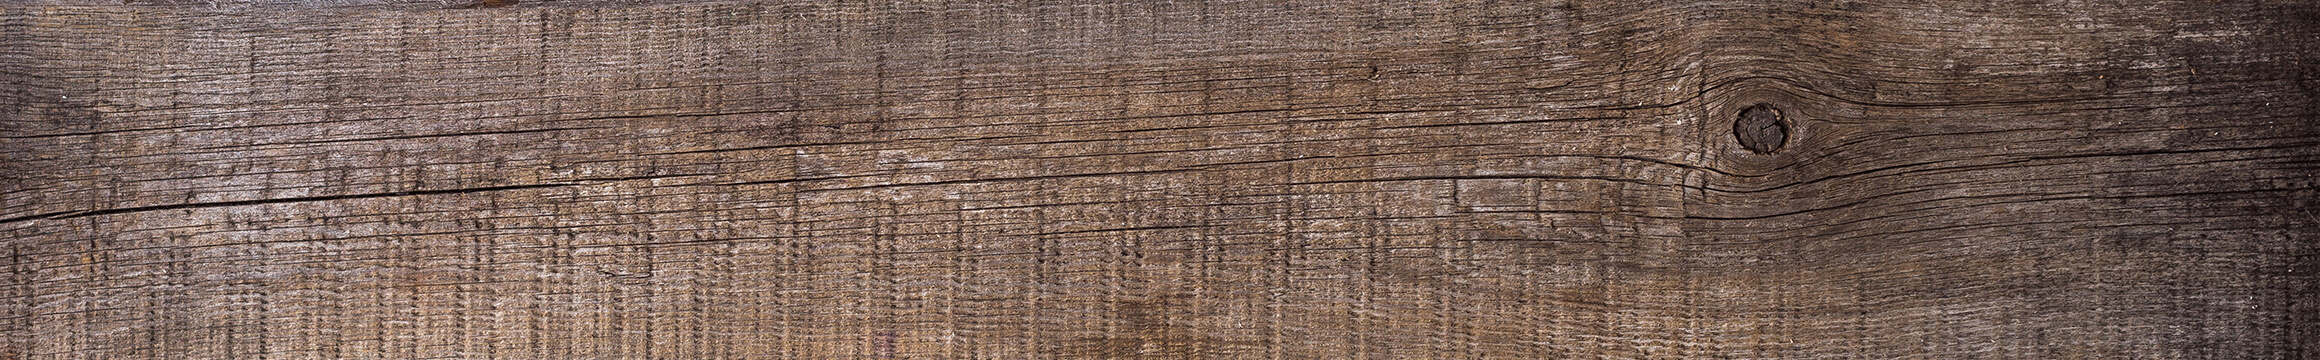 Woodgrain 04